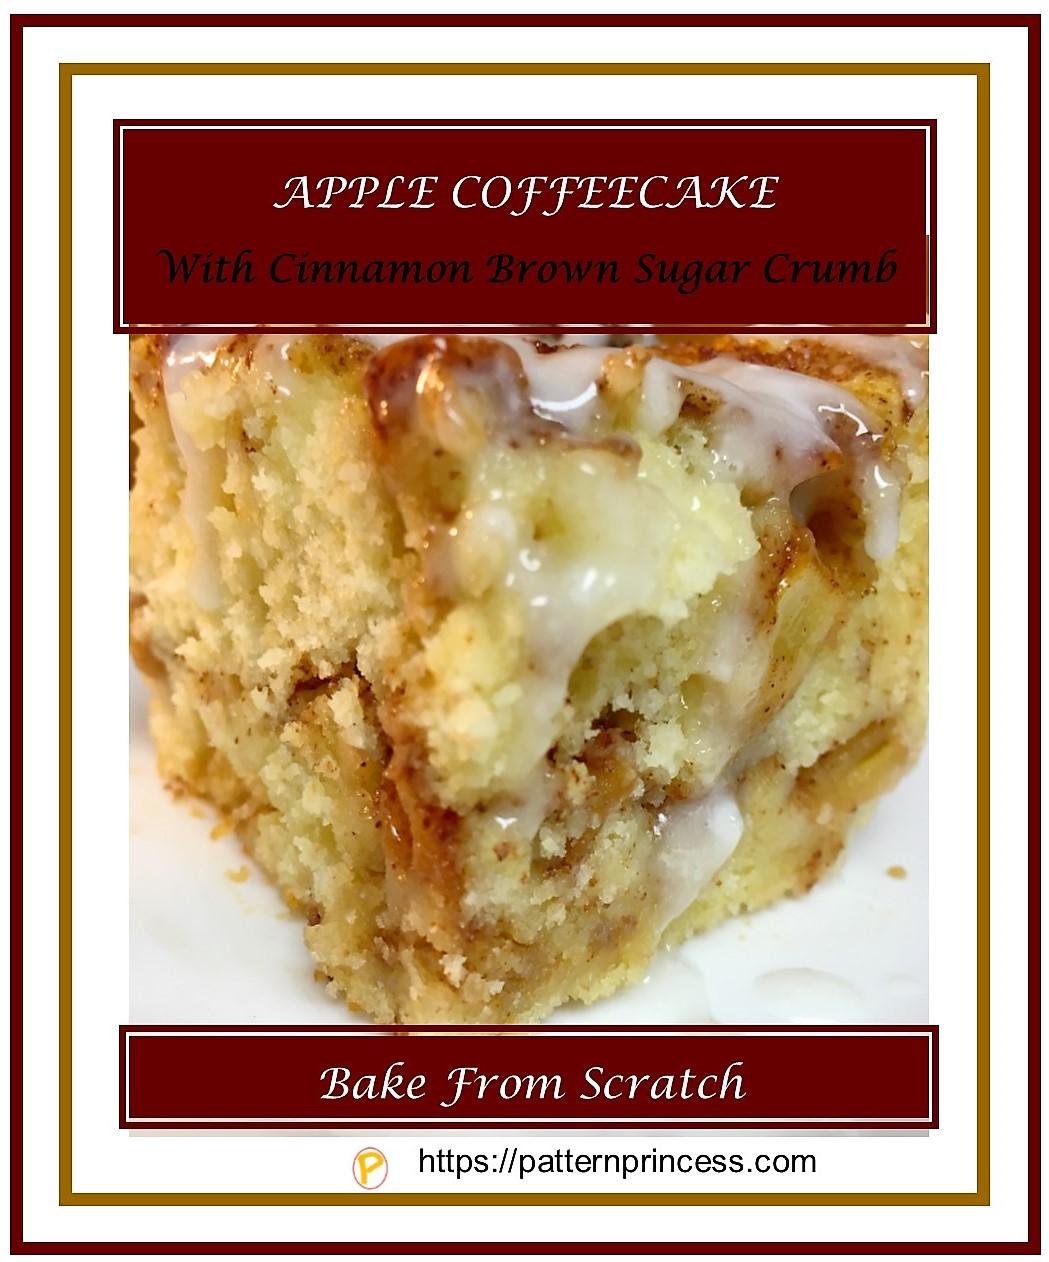 Apple Coffeecake with Cinnamon Brown Sugar Crumb 1